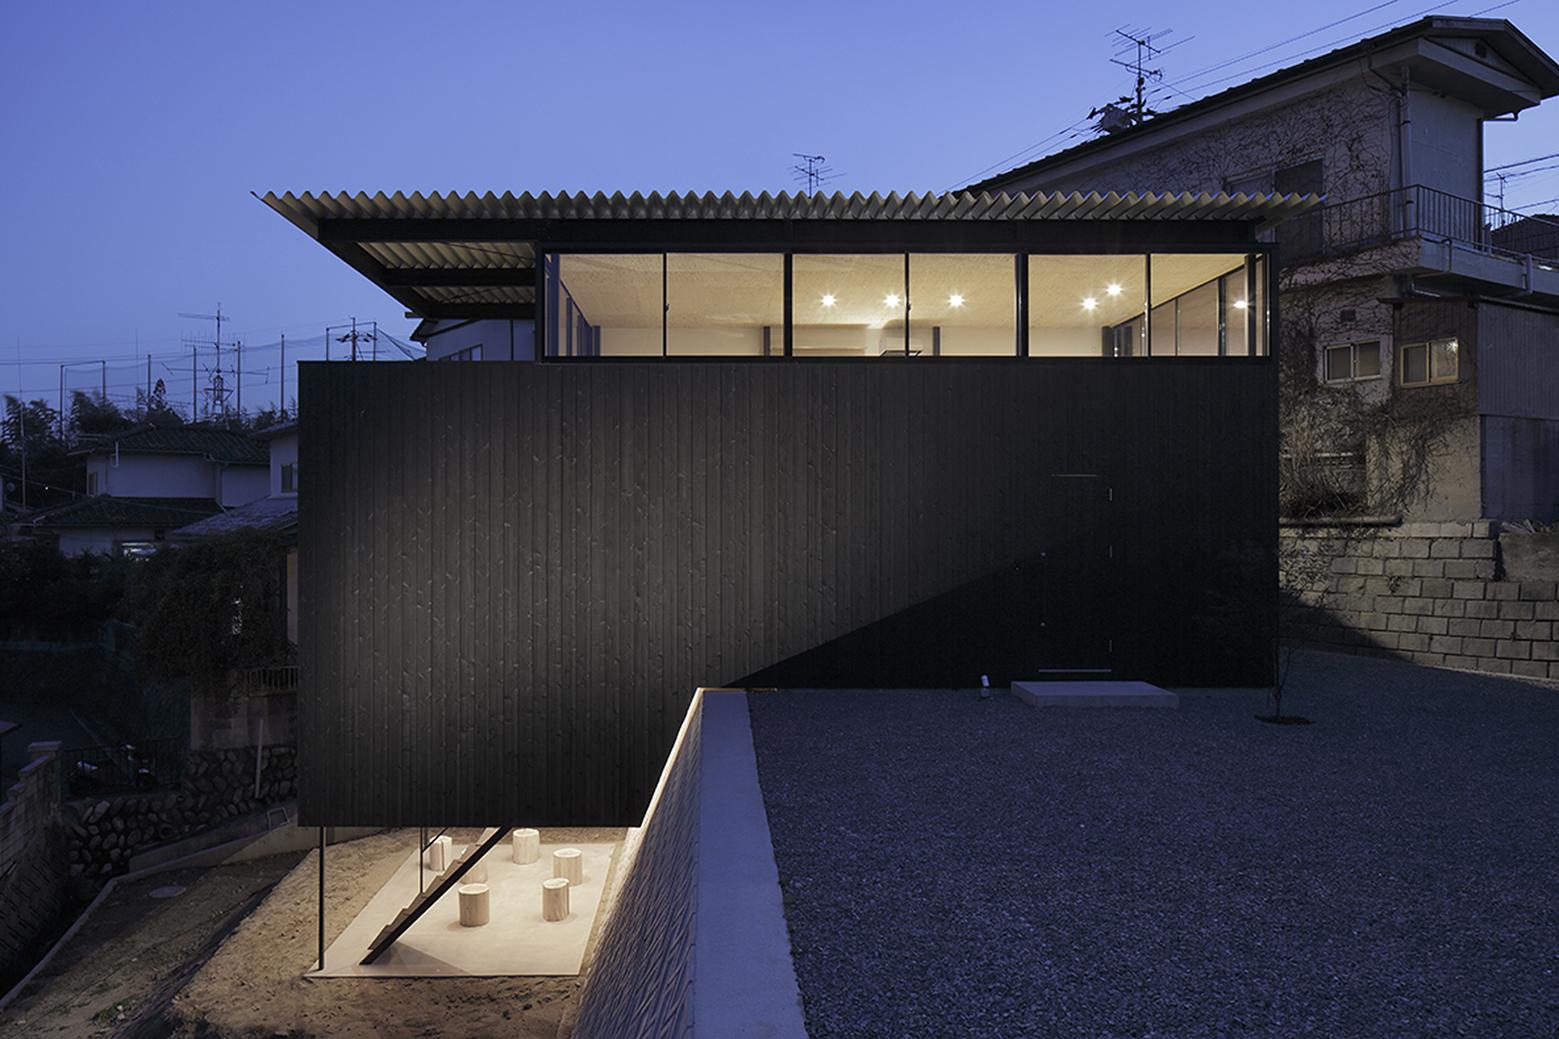 540ea13fc07a80b90600014d_house-in-miyake-hidetaka-nakahara-architects-yoshio-ohno-architects_oono_miyake_140407_002